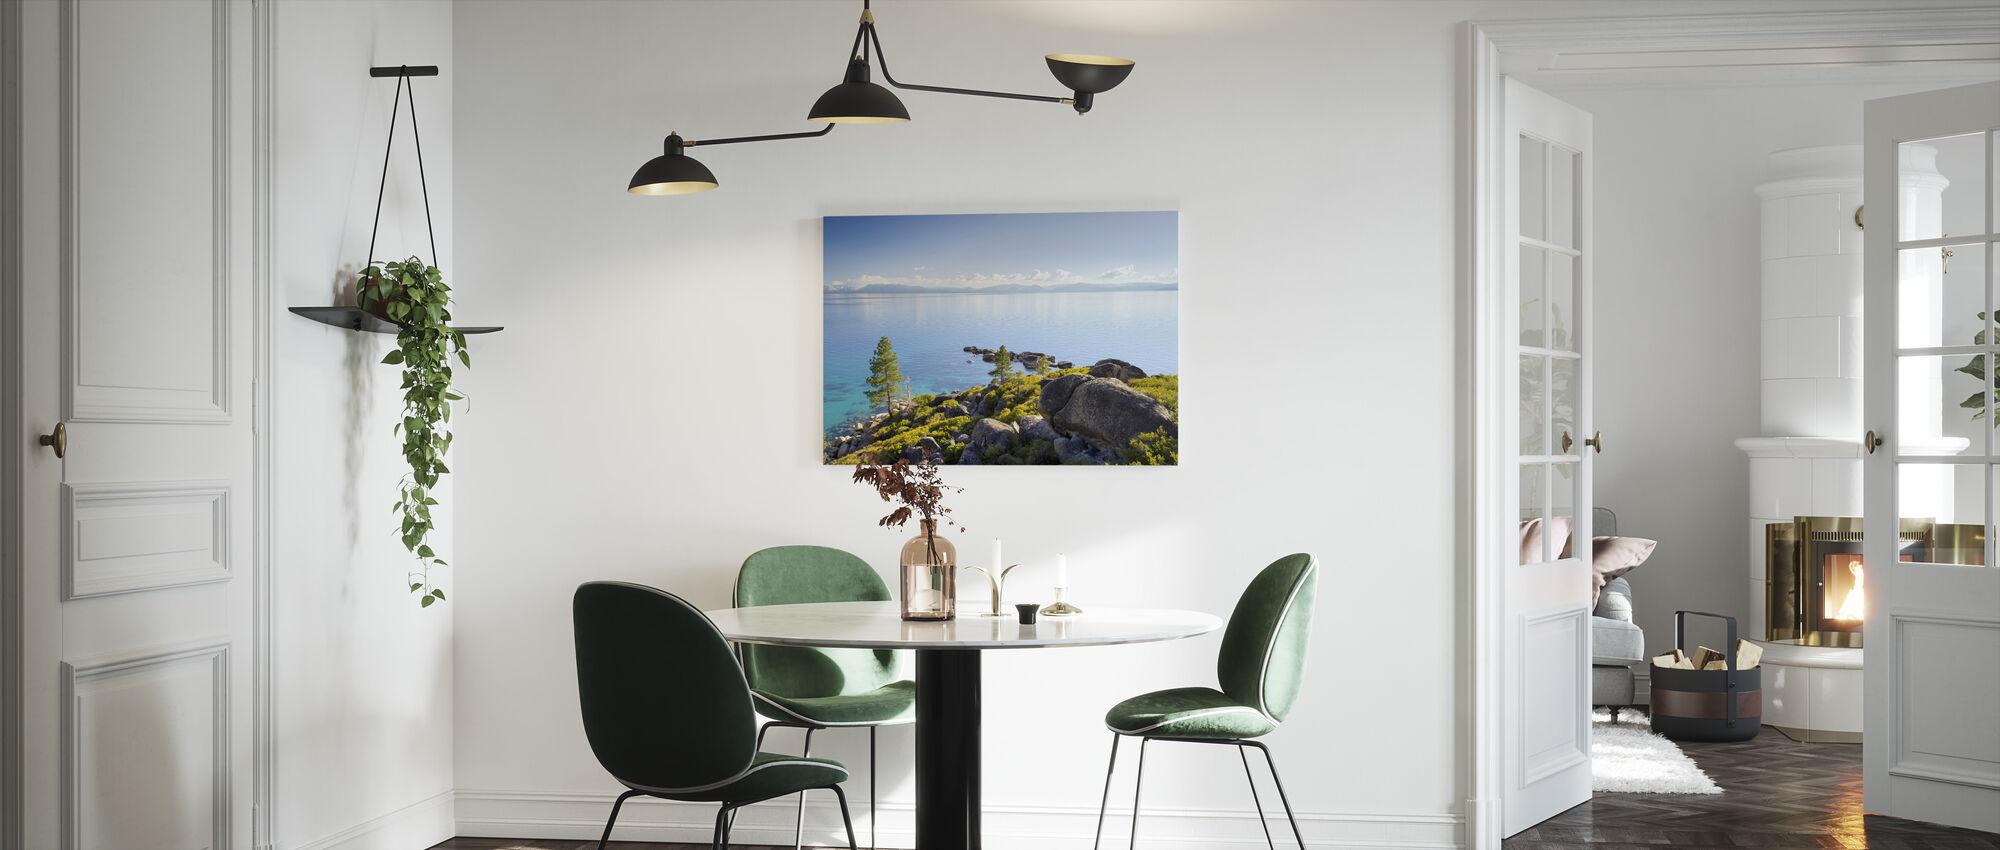 Skärgårds drömmar - Canvastavla - Kök